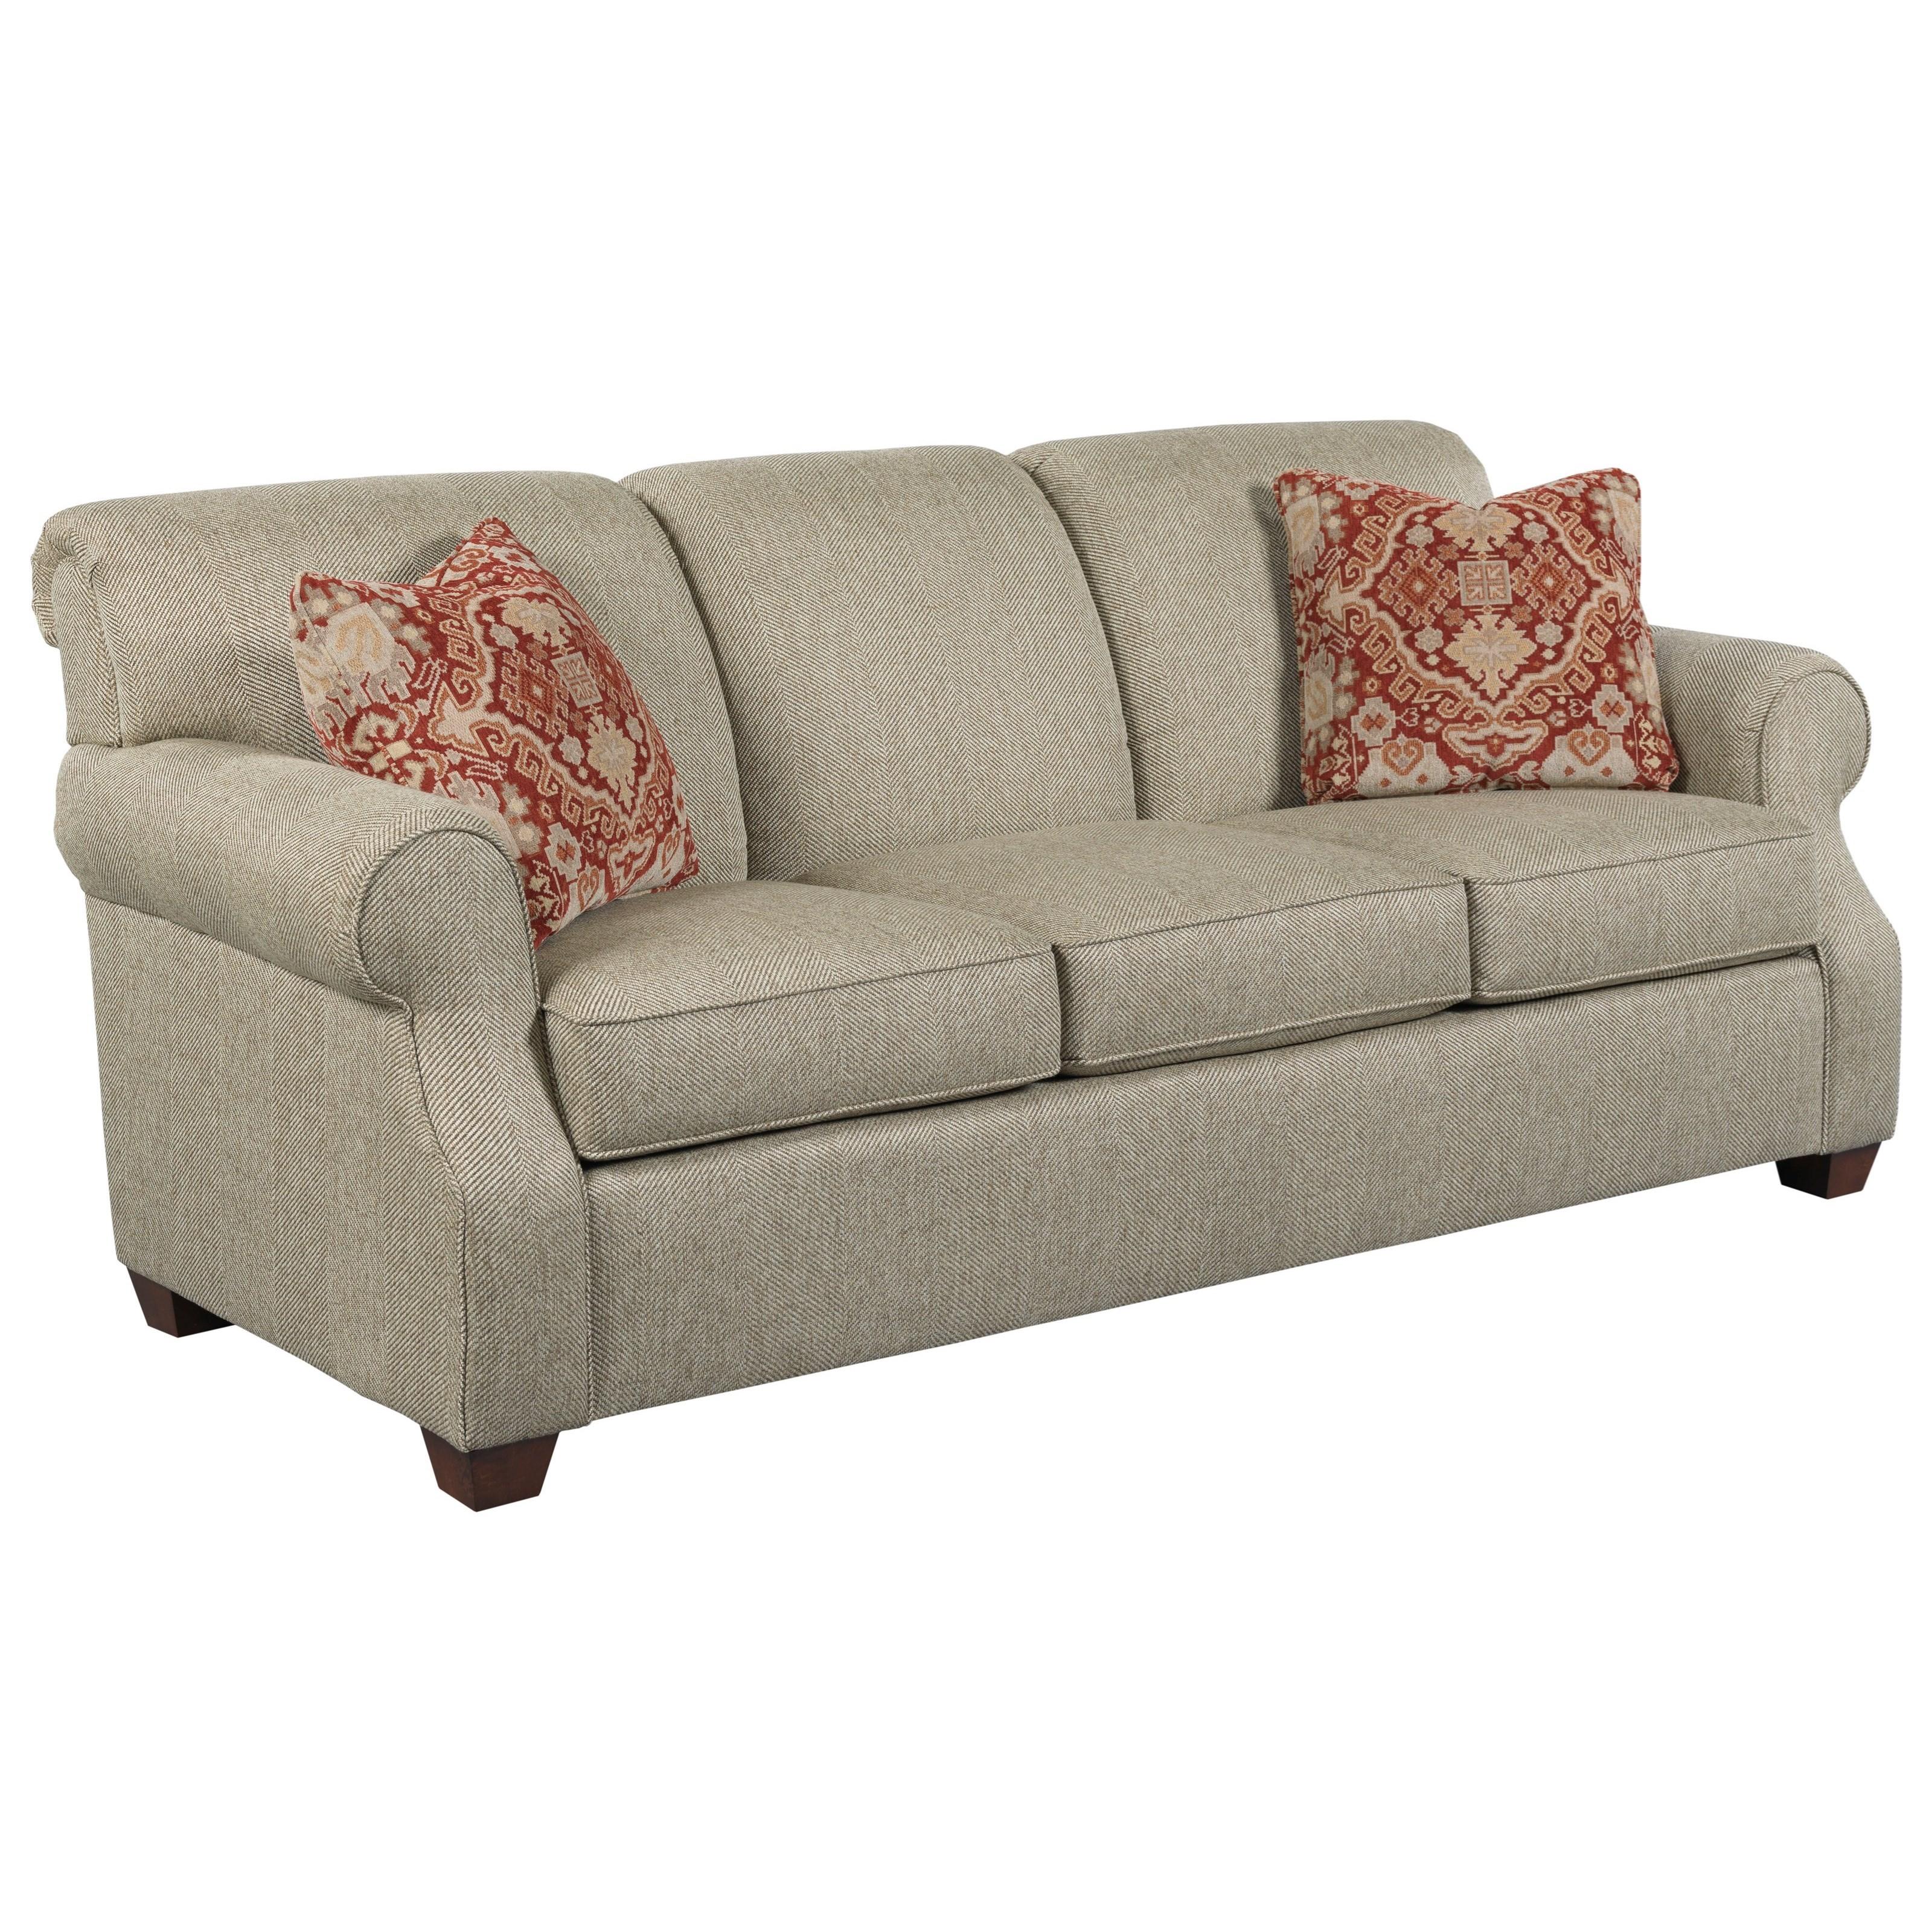 Lynchburg Sofa by Kincaid Furniture at Johnny Janosik